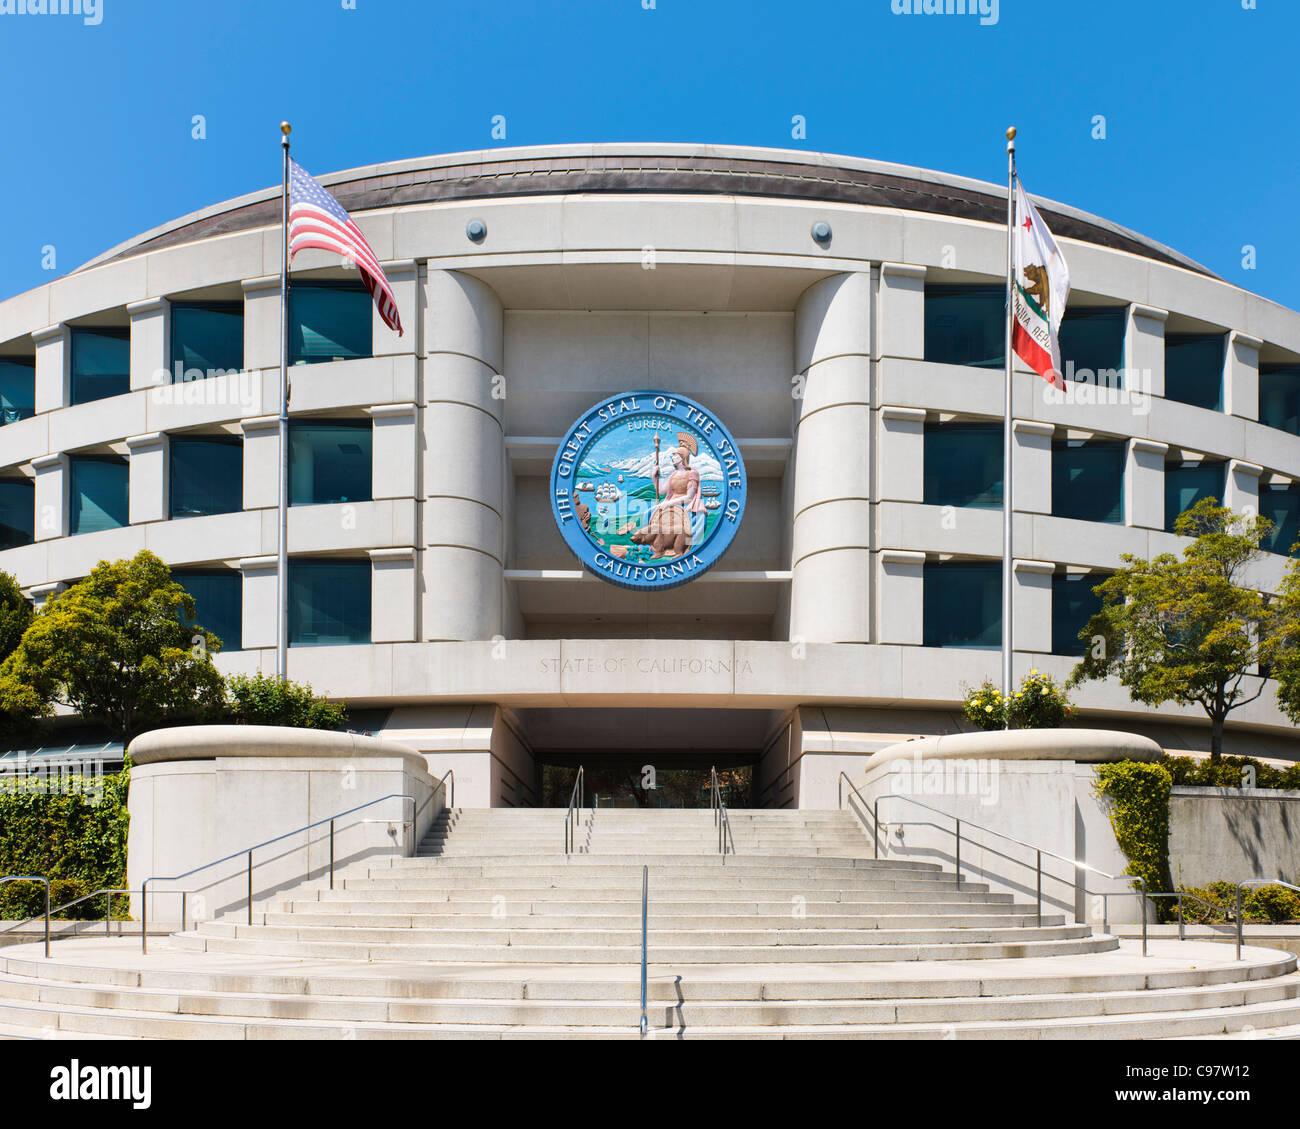 San Francisco Public Utilities Commission - Stock Image